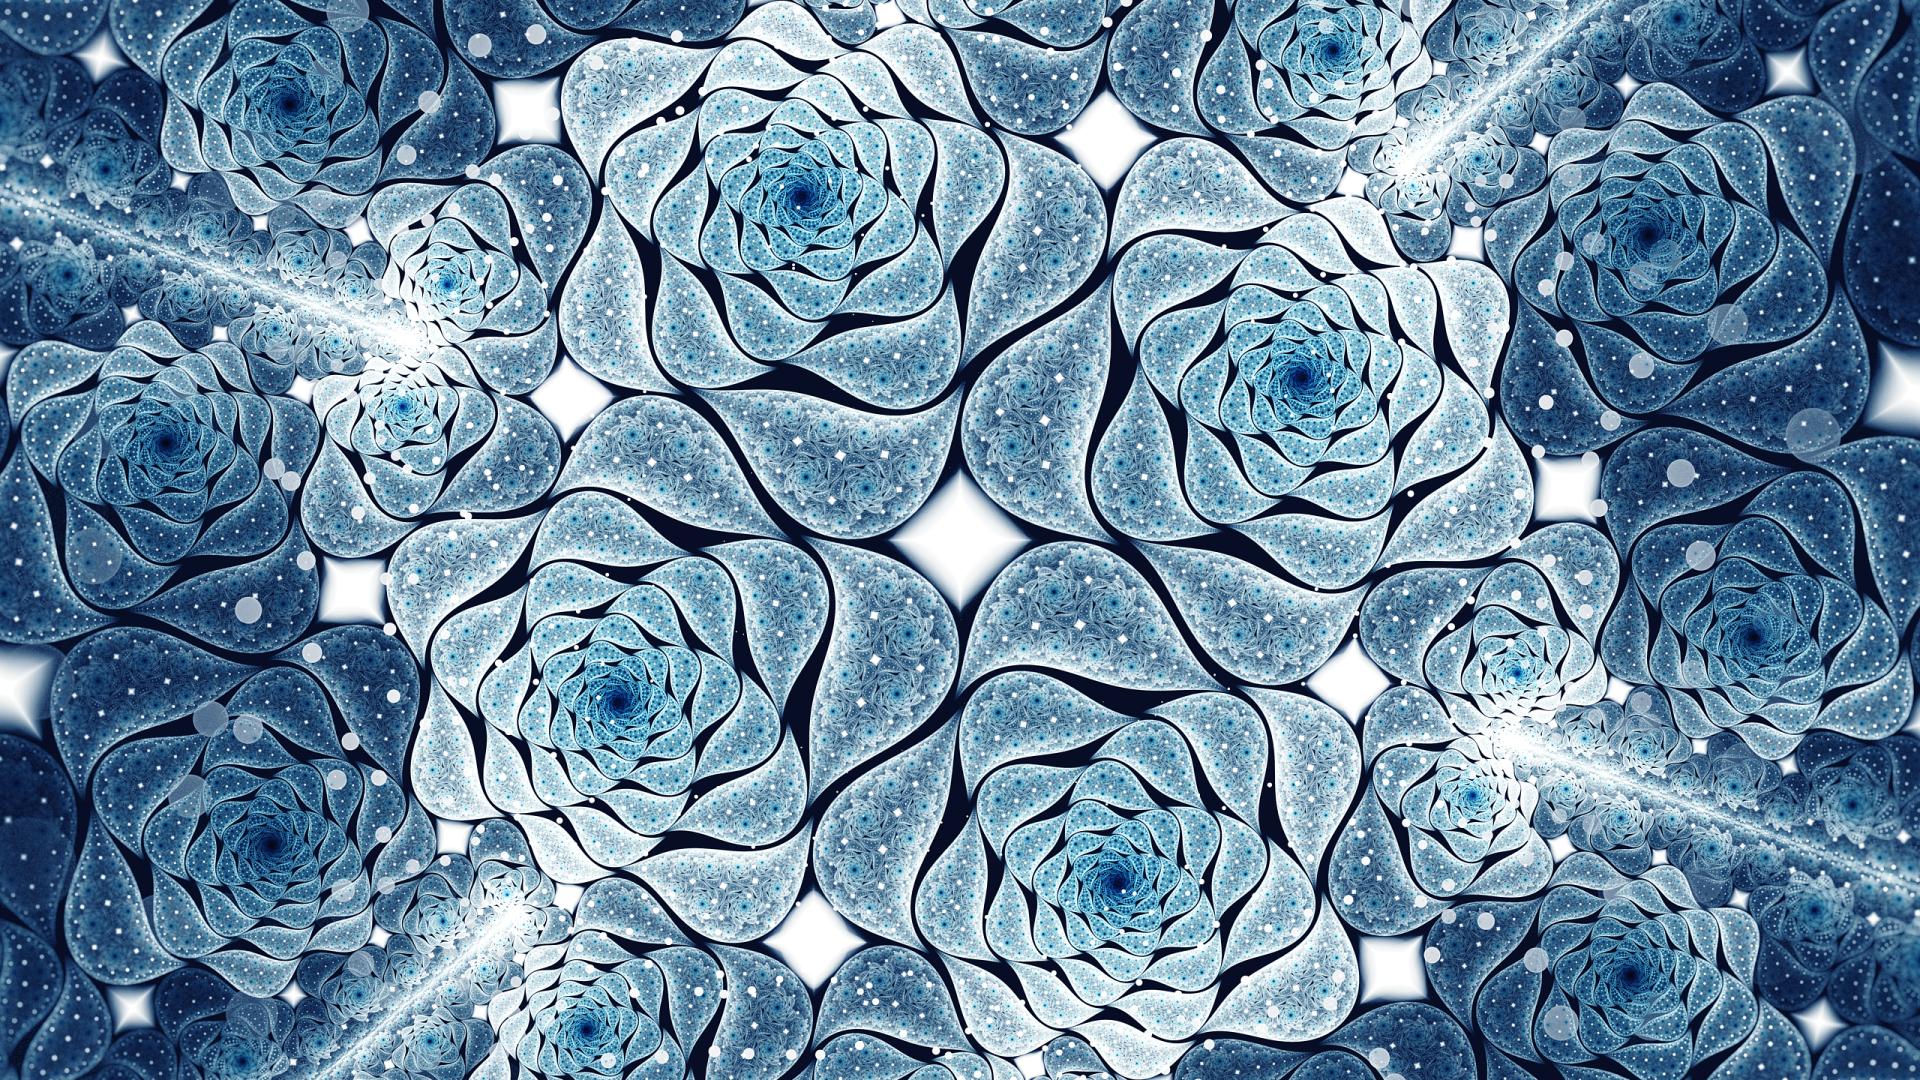 Abstract - Fractal  Flower Artistic Blue Pattern Wallpaper